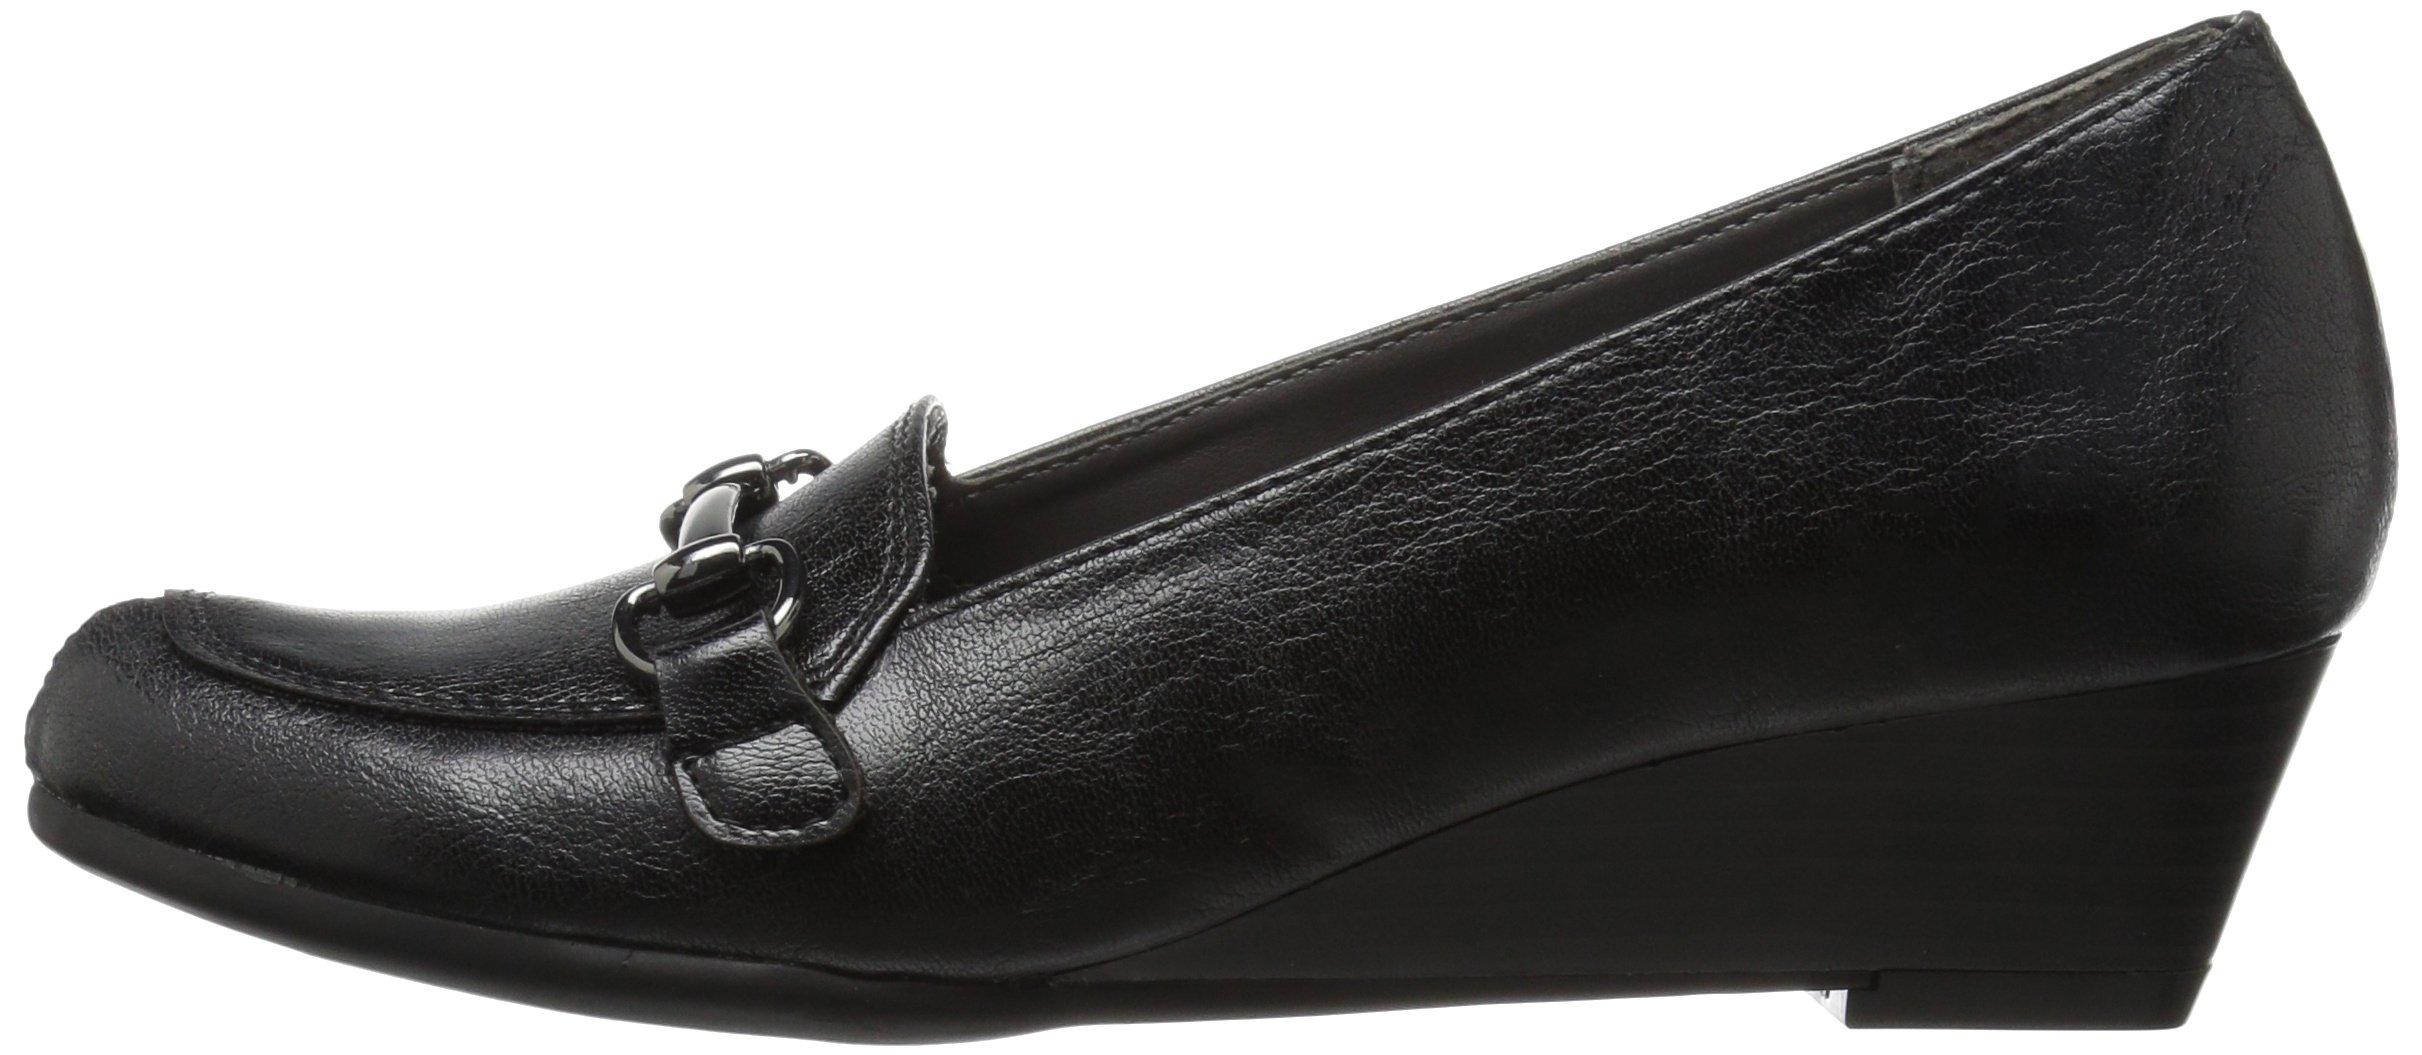 Aerosoles A2 by Women's Love Spell Slip-on Loafer, Black, 8 M US by Aerosoles (Image #5)